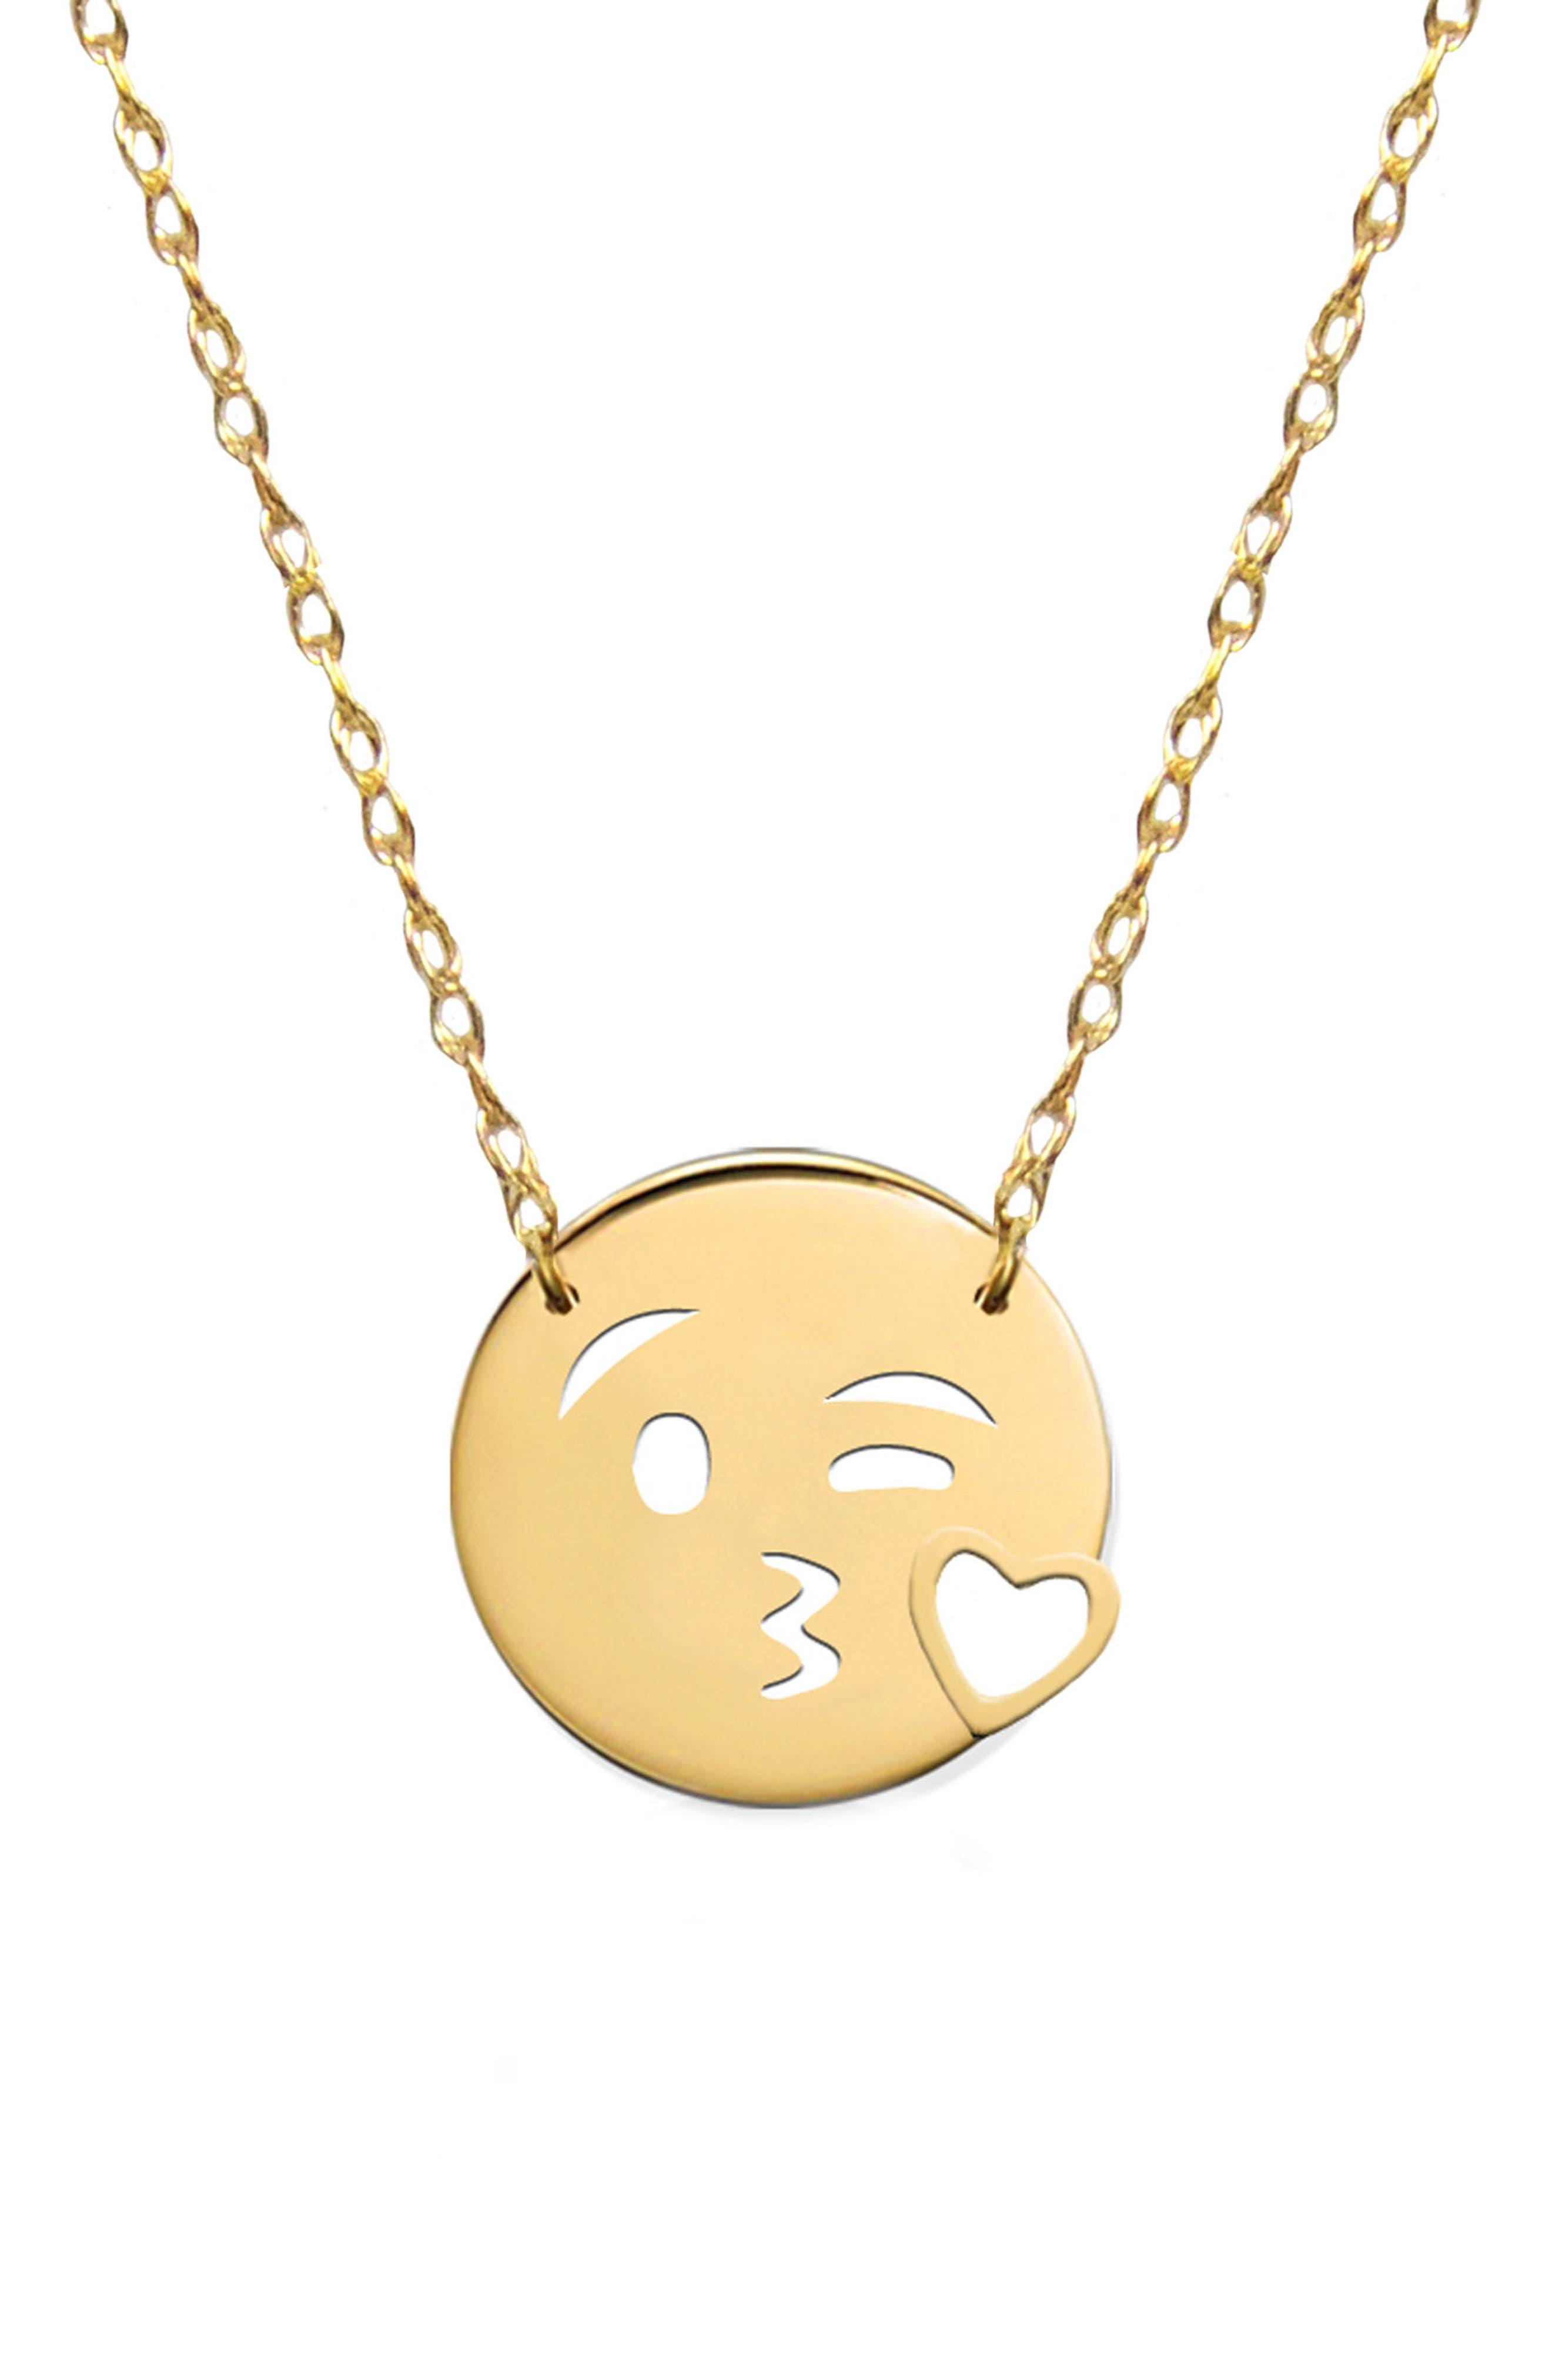 Alternate Image 1 Selected - Jane Basch Designs Kiss Love Emoji Pendant Necklace (Nordstrom Exclusive)